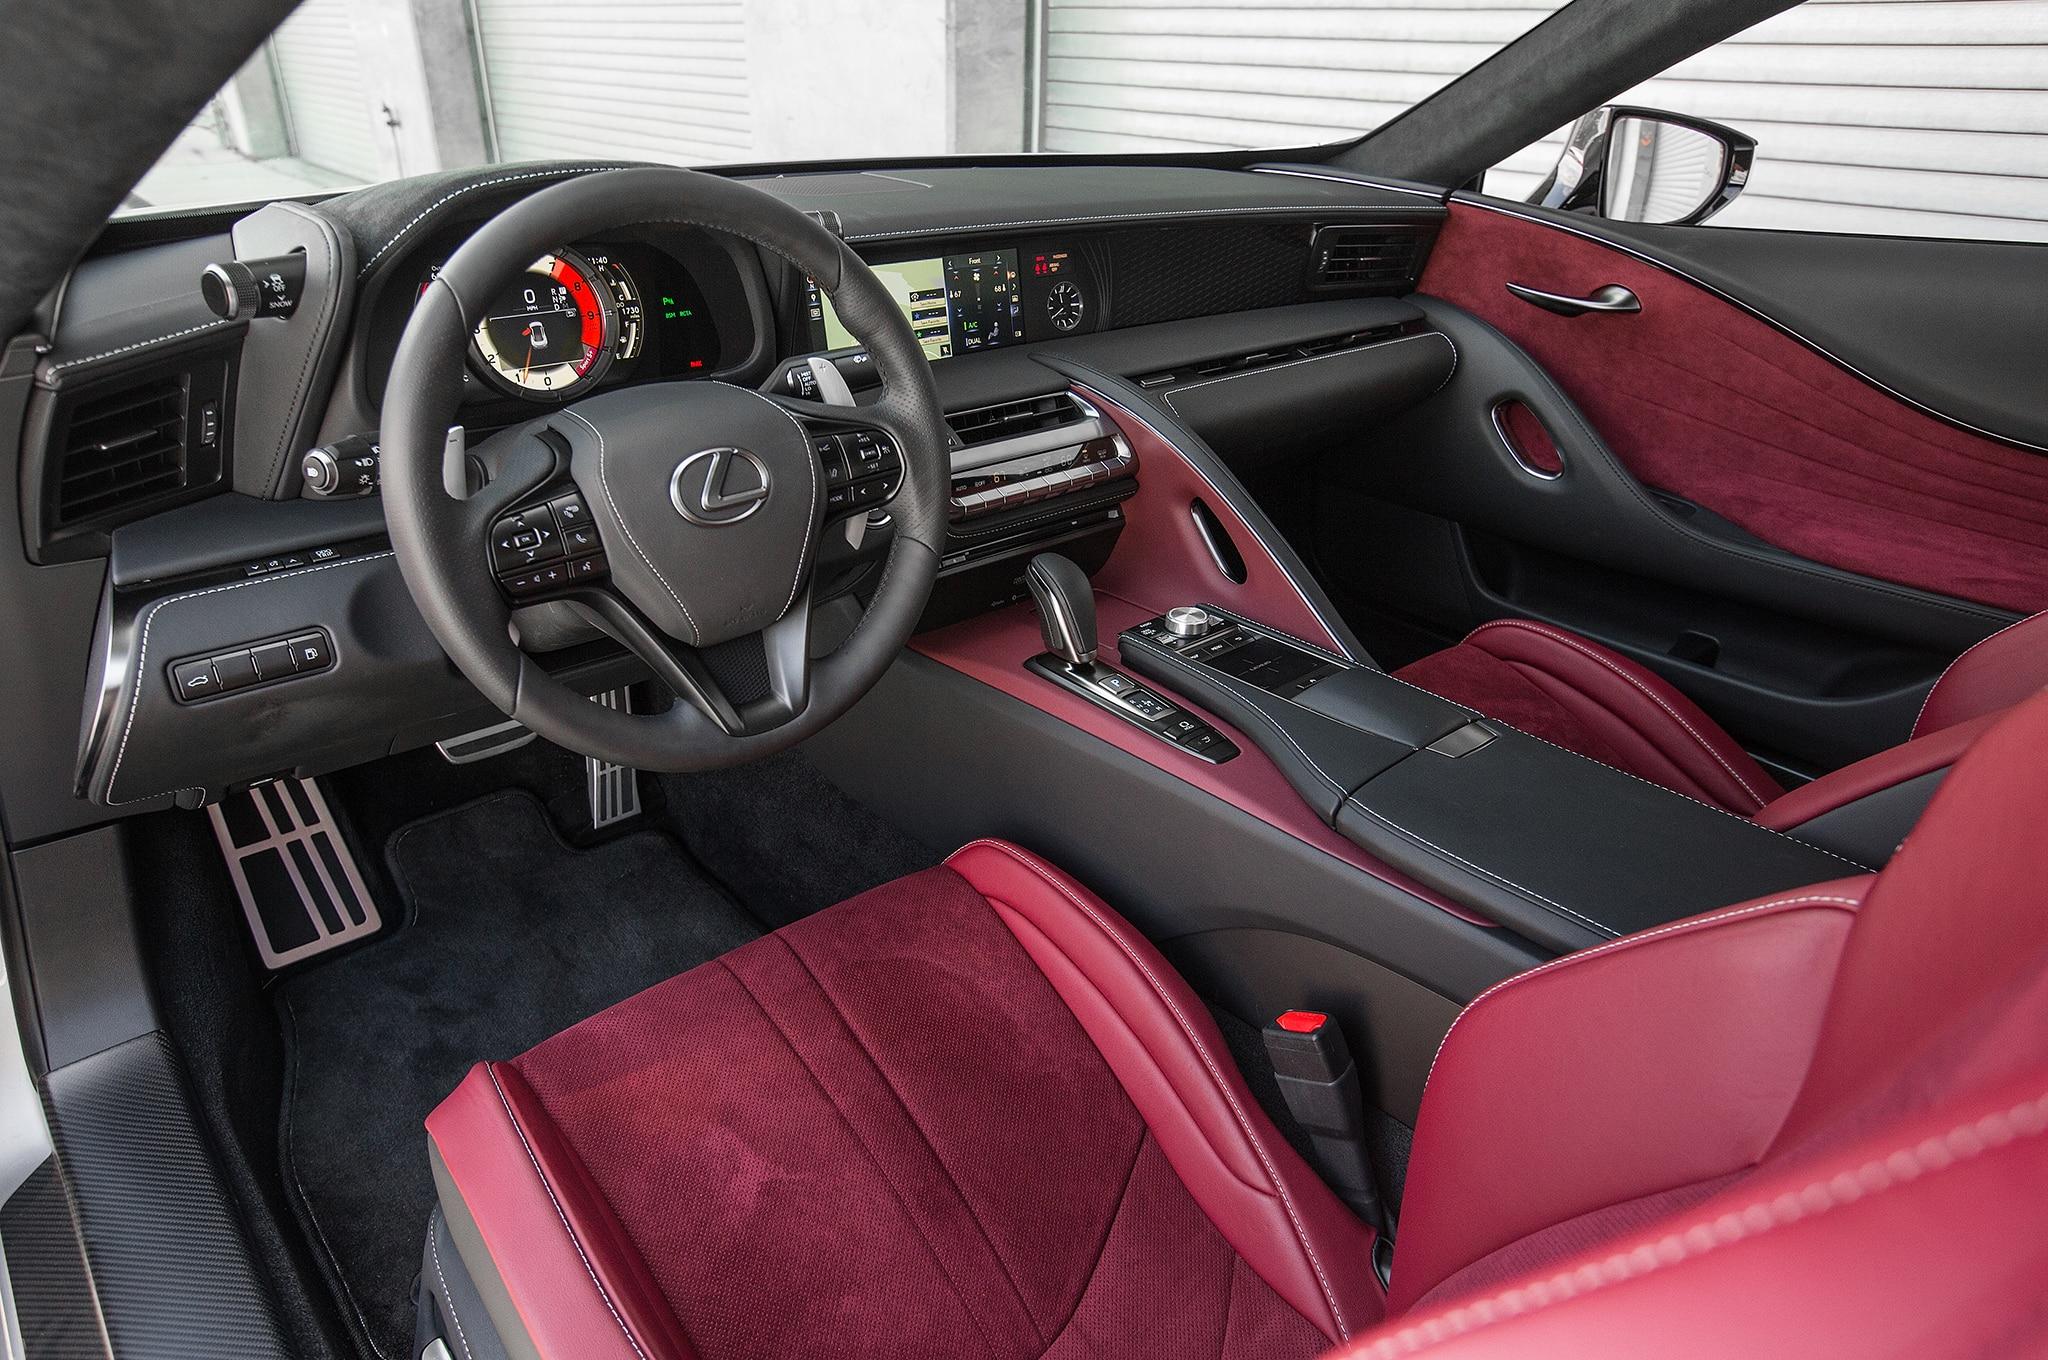 http://st.automobilemag.com/uploads/sites/5/2017/09/2018-Lexus-LC-500-interior-detail.jpg